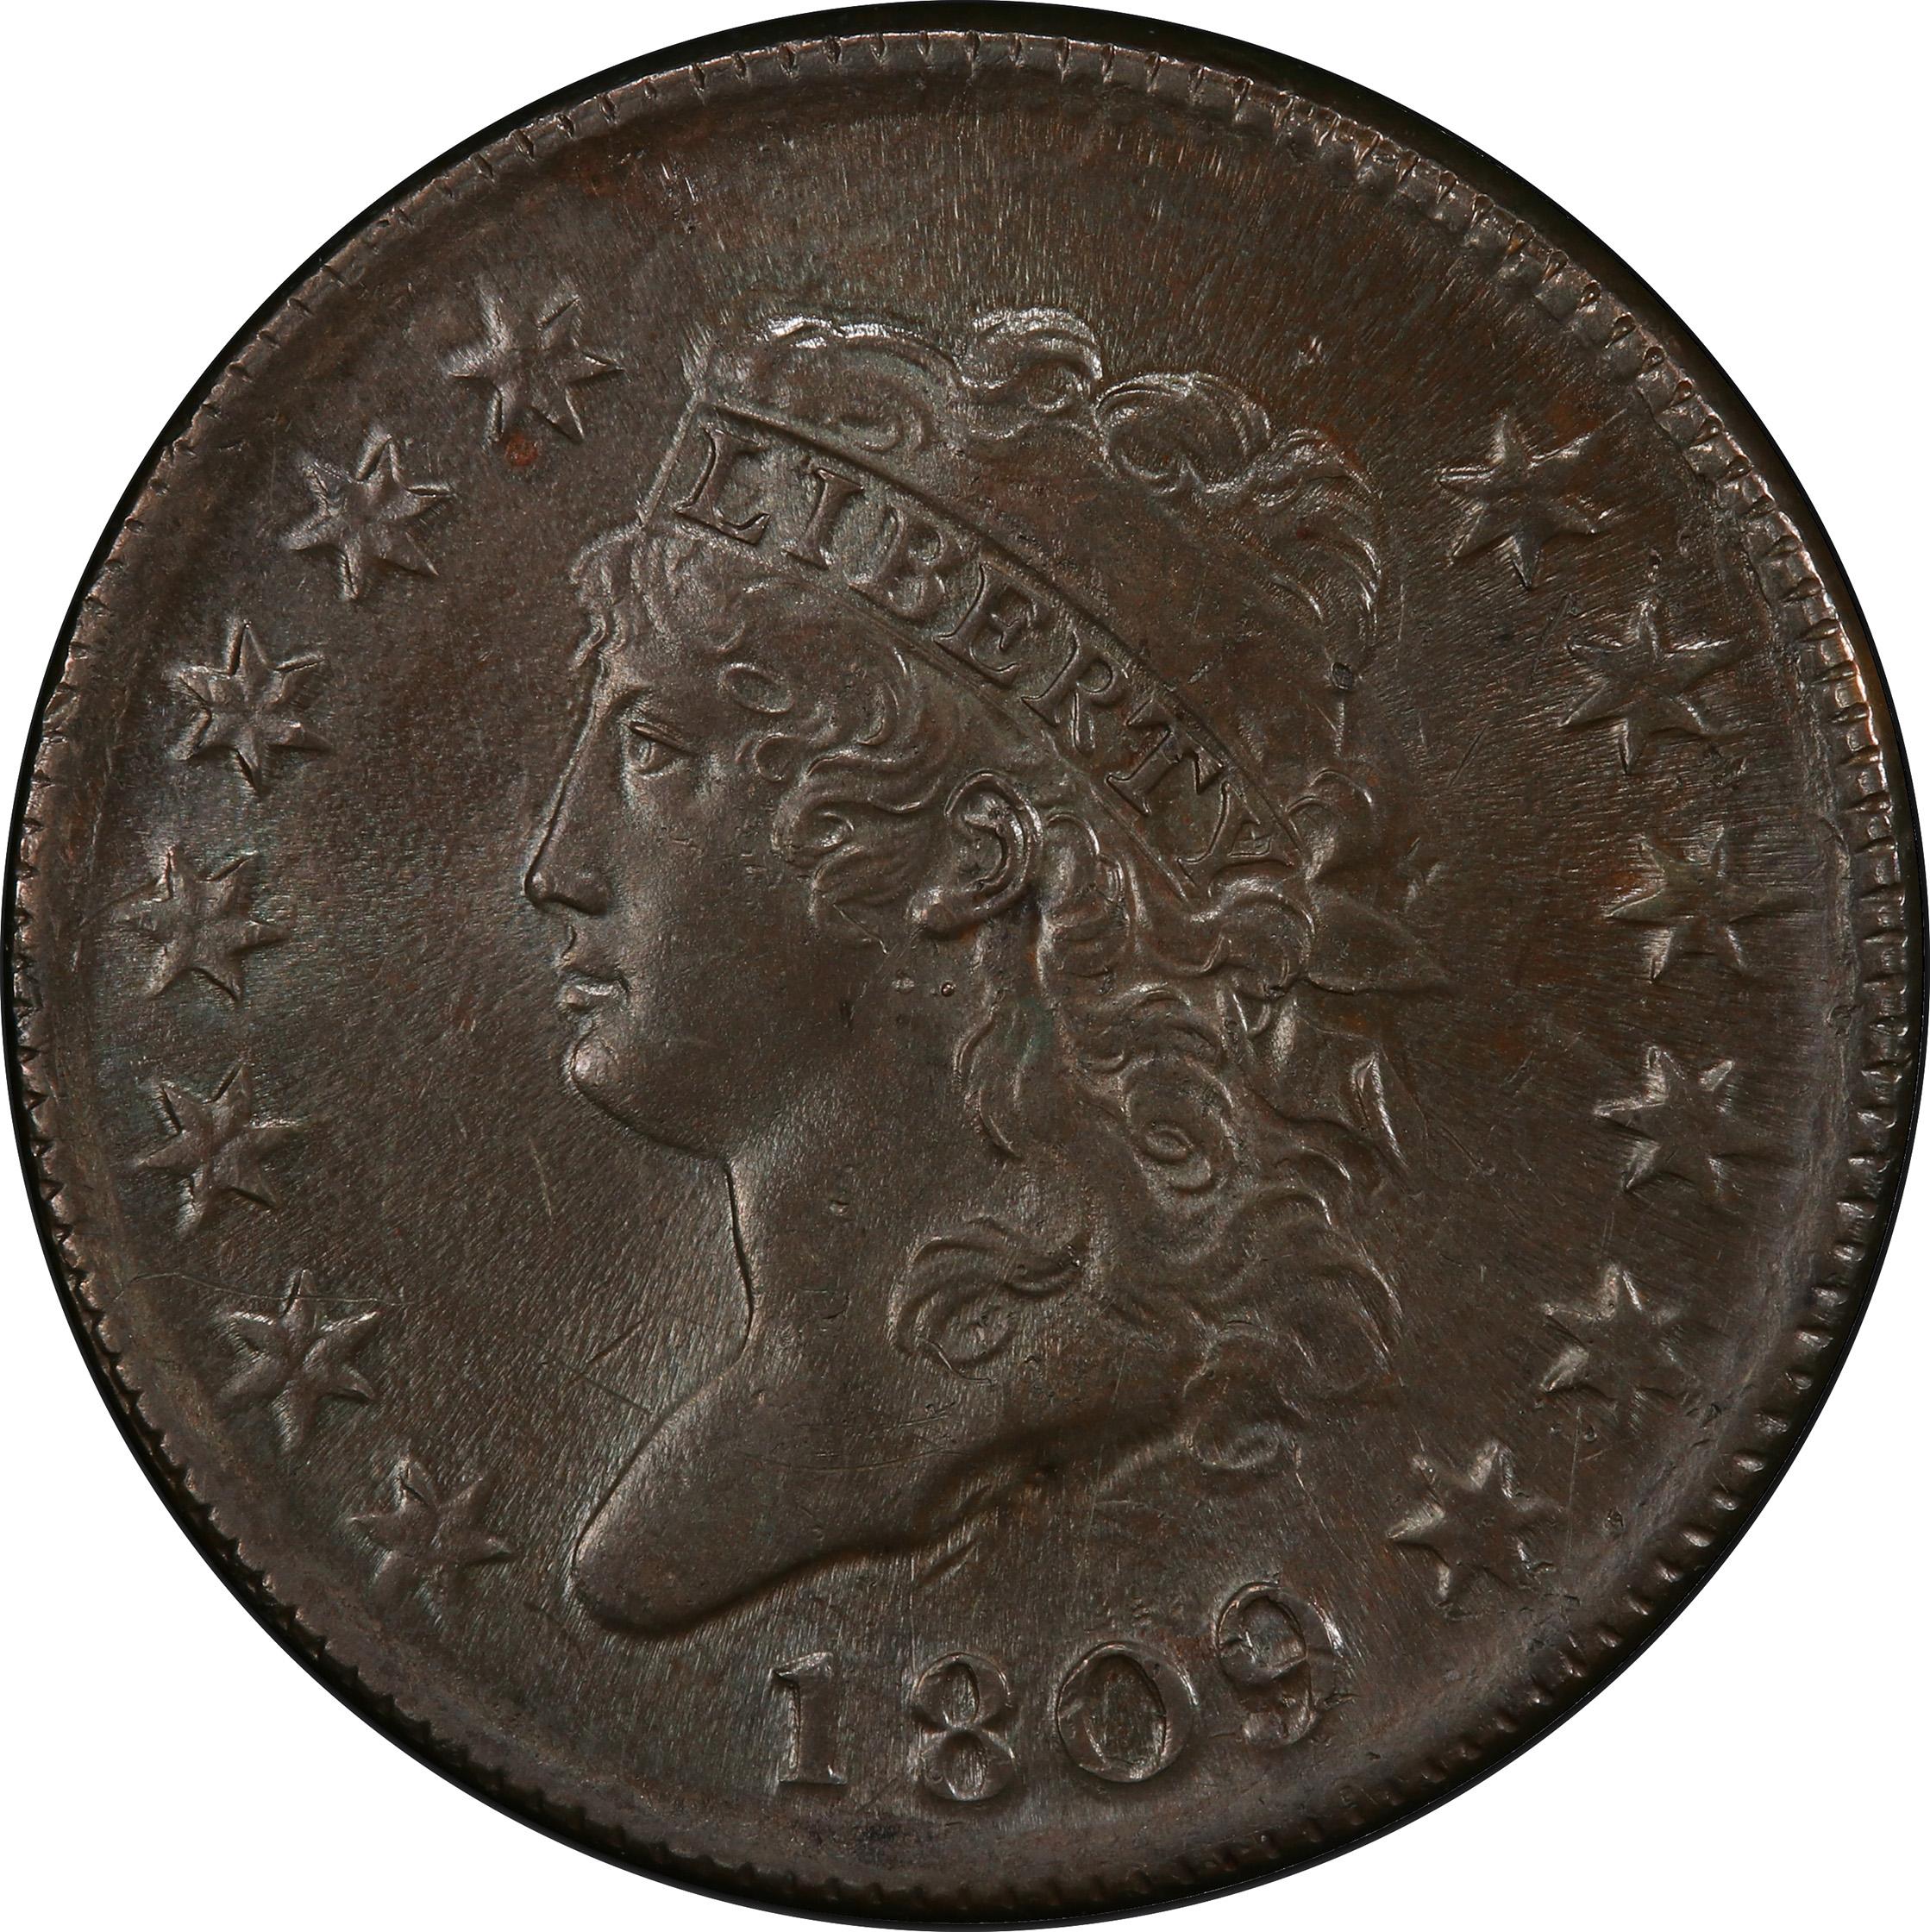 rare 1c coins